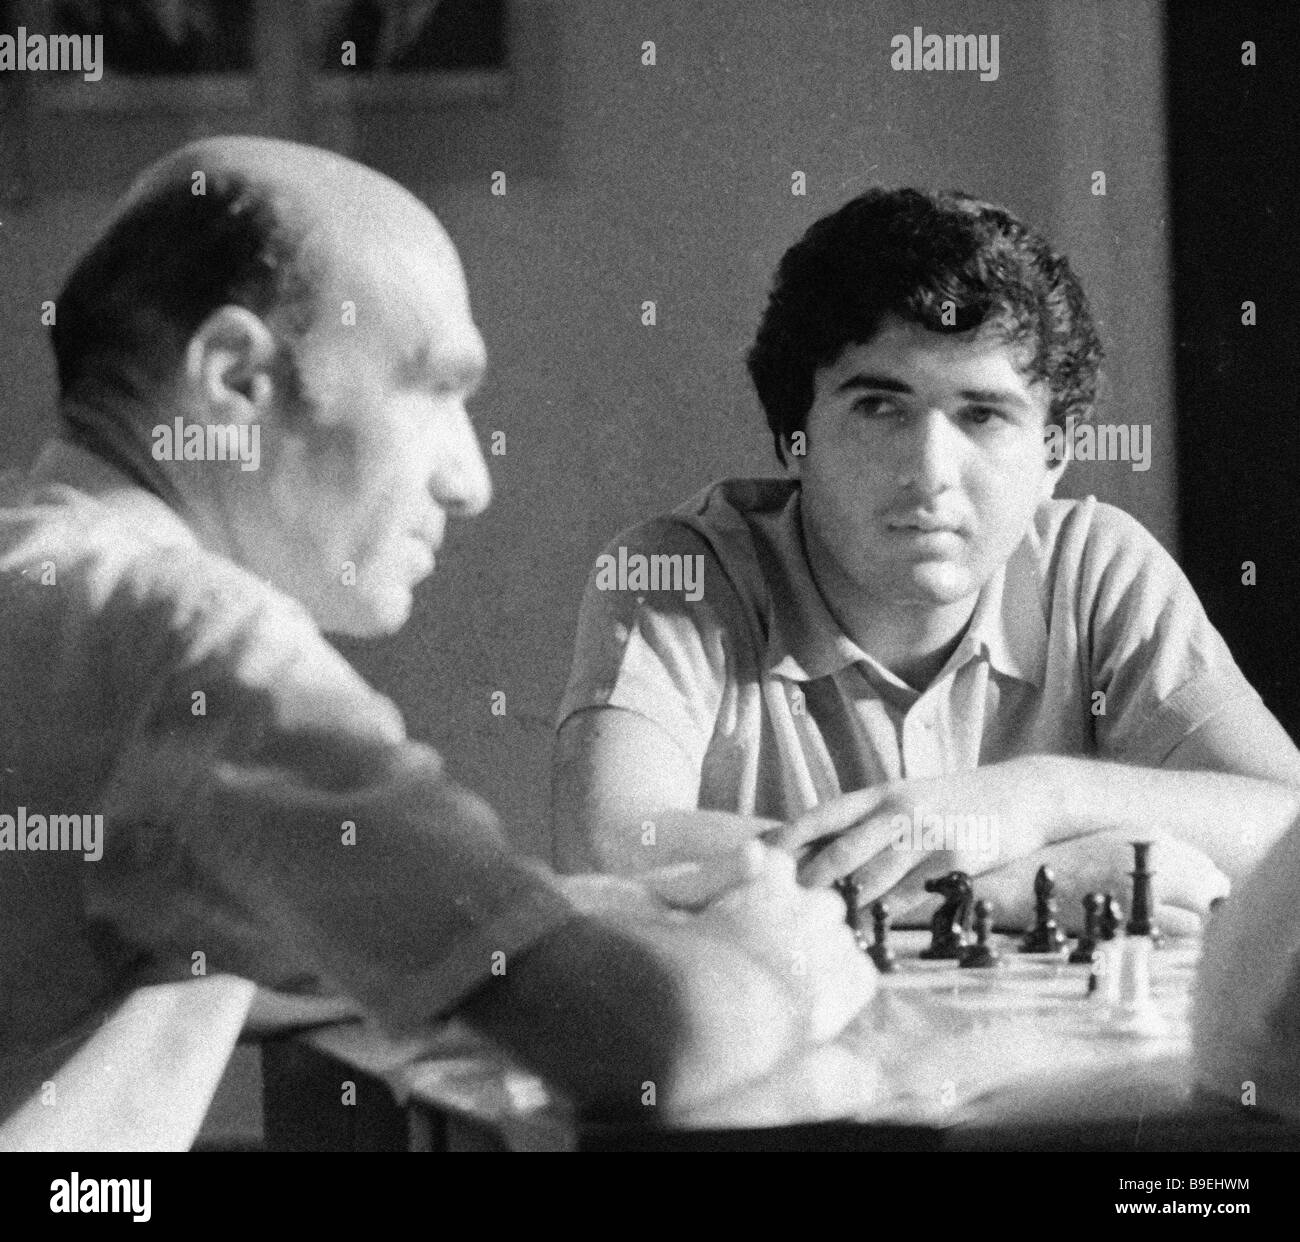 Maître d'échecs Rafael Vaganyan droite et honorable coach d'Arménie gauche Mokatsyan Akop Photo Stock